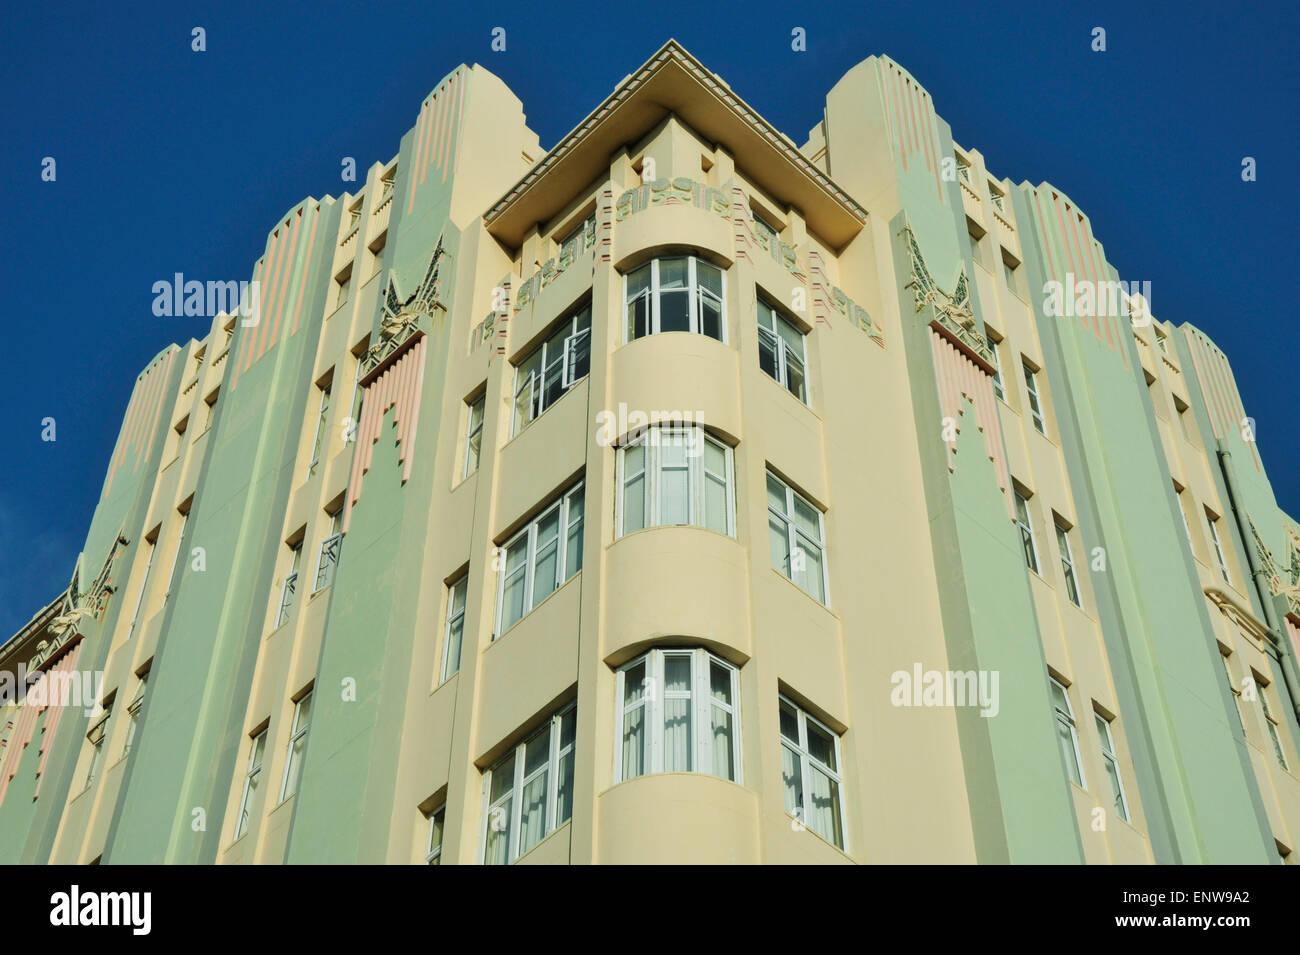 Architecture detail of surrey mansions landmark art deco for Art deco architectural details